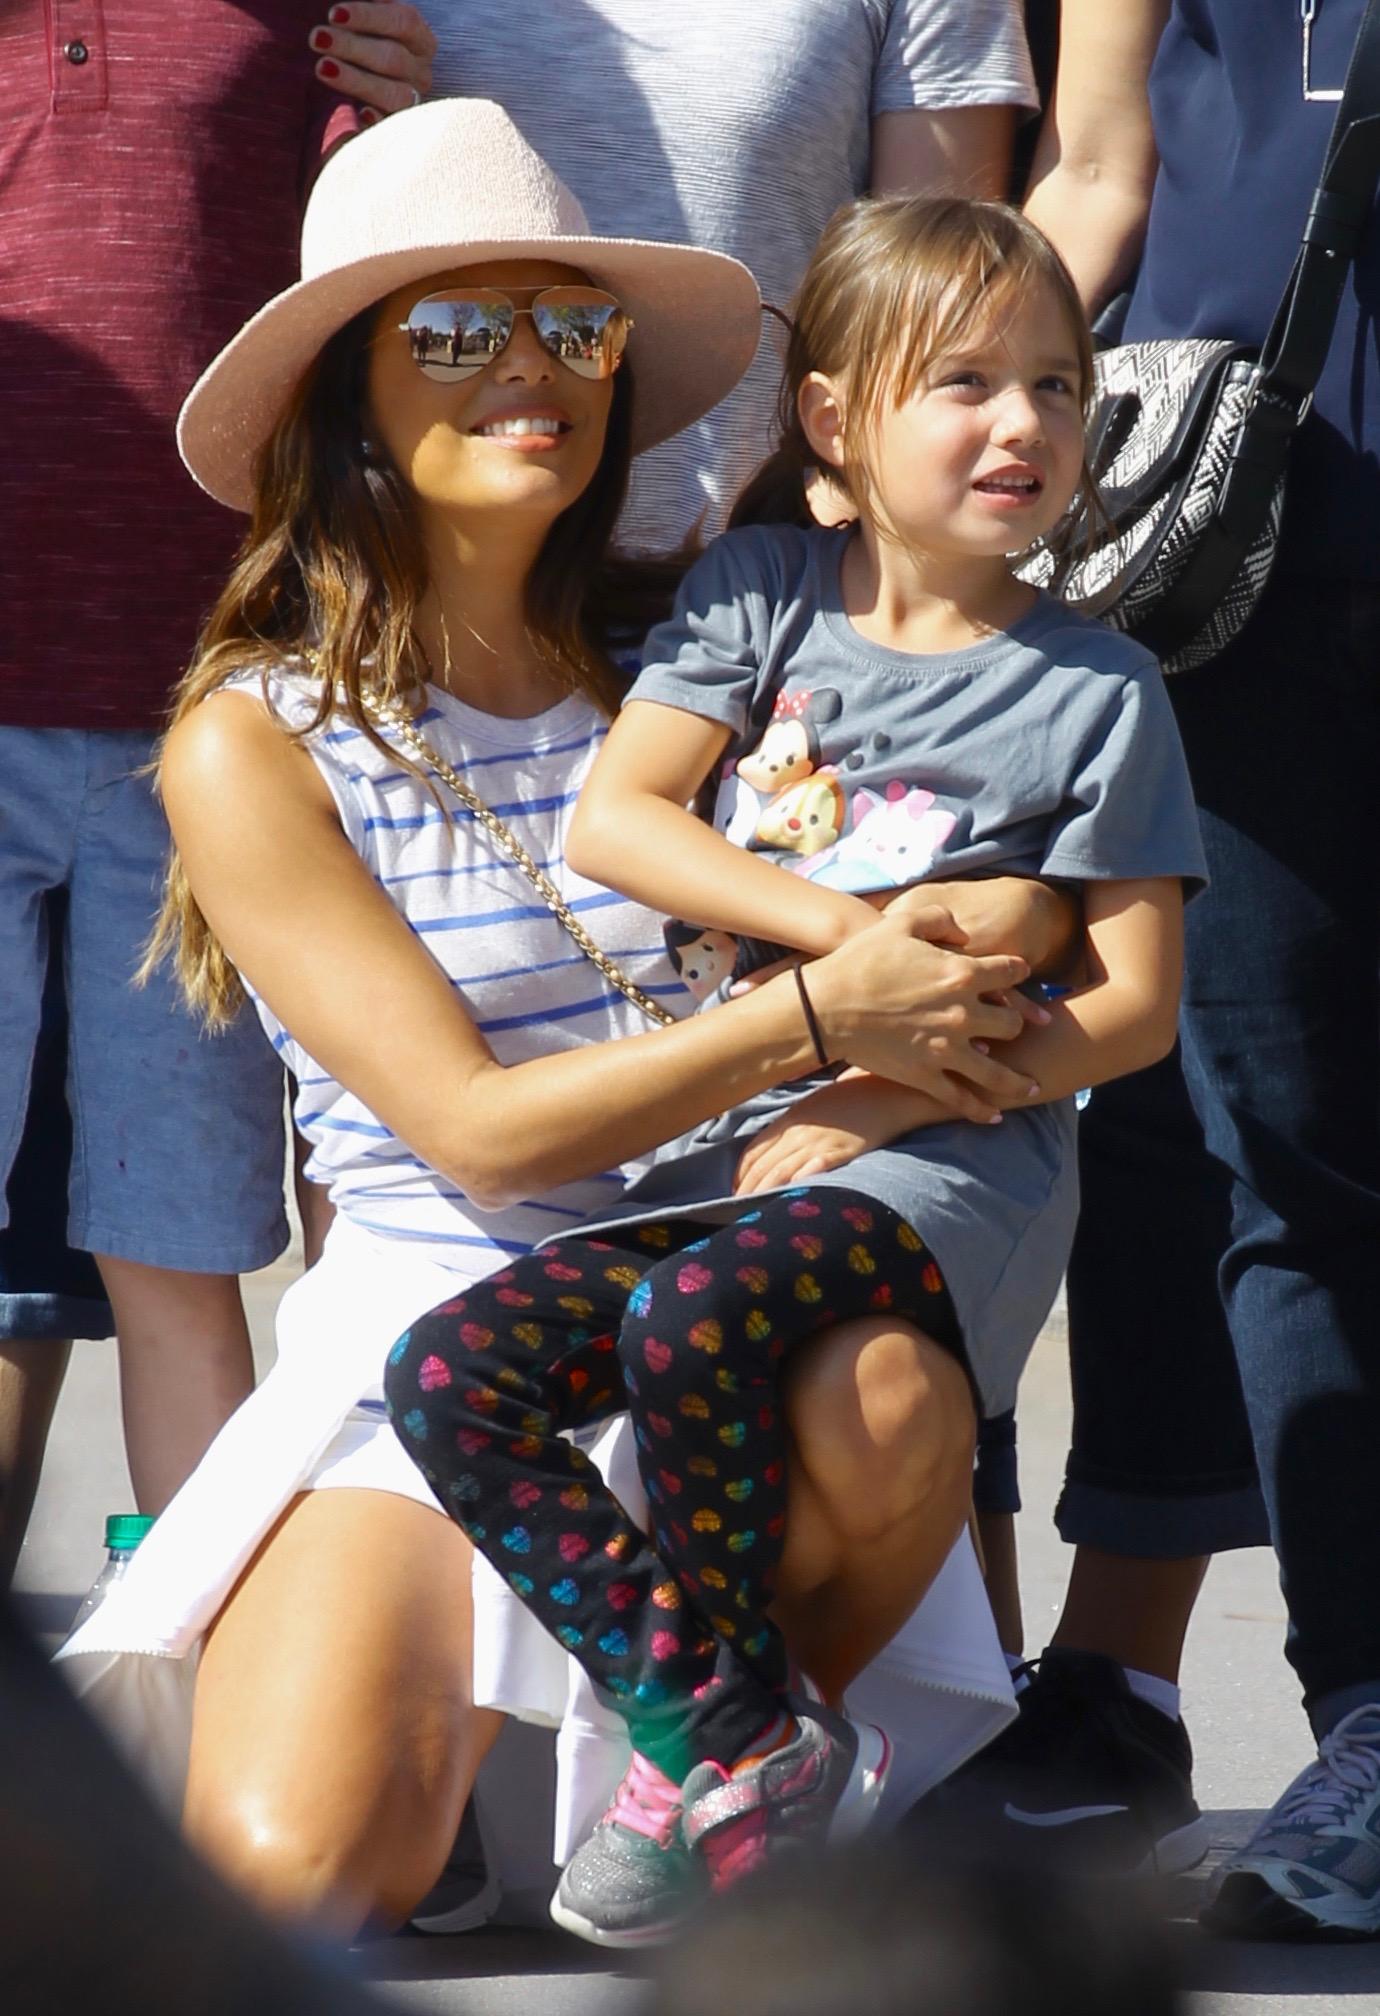 Eva Longoria Celebrates Her 42nd Birthday With Family At Disneyland